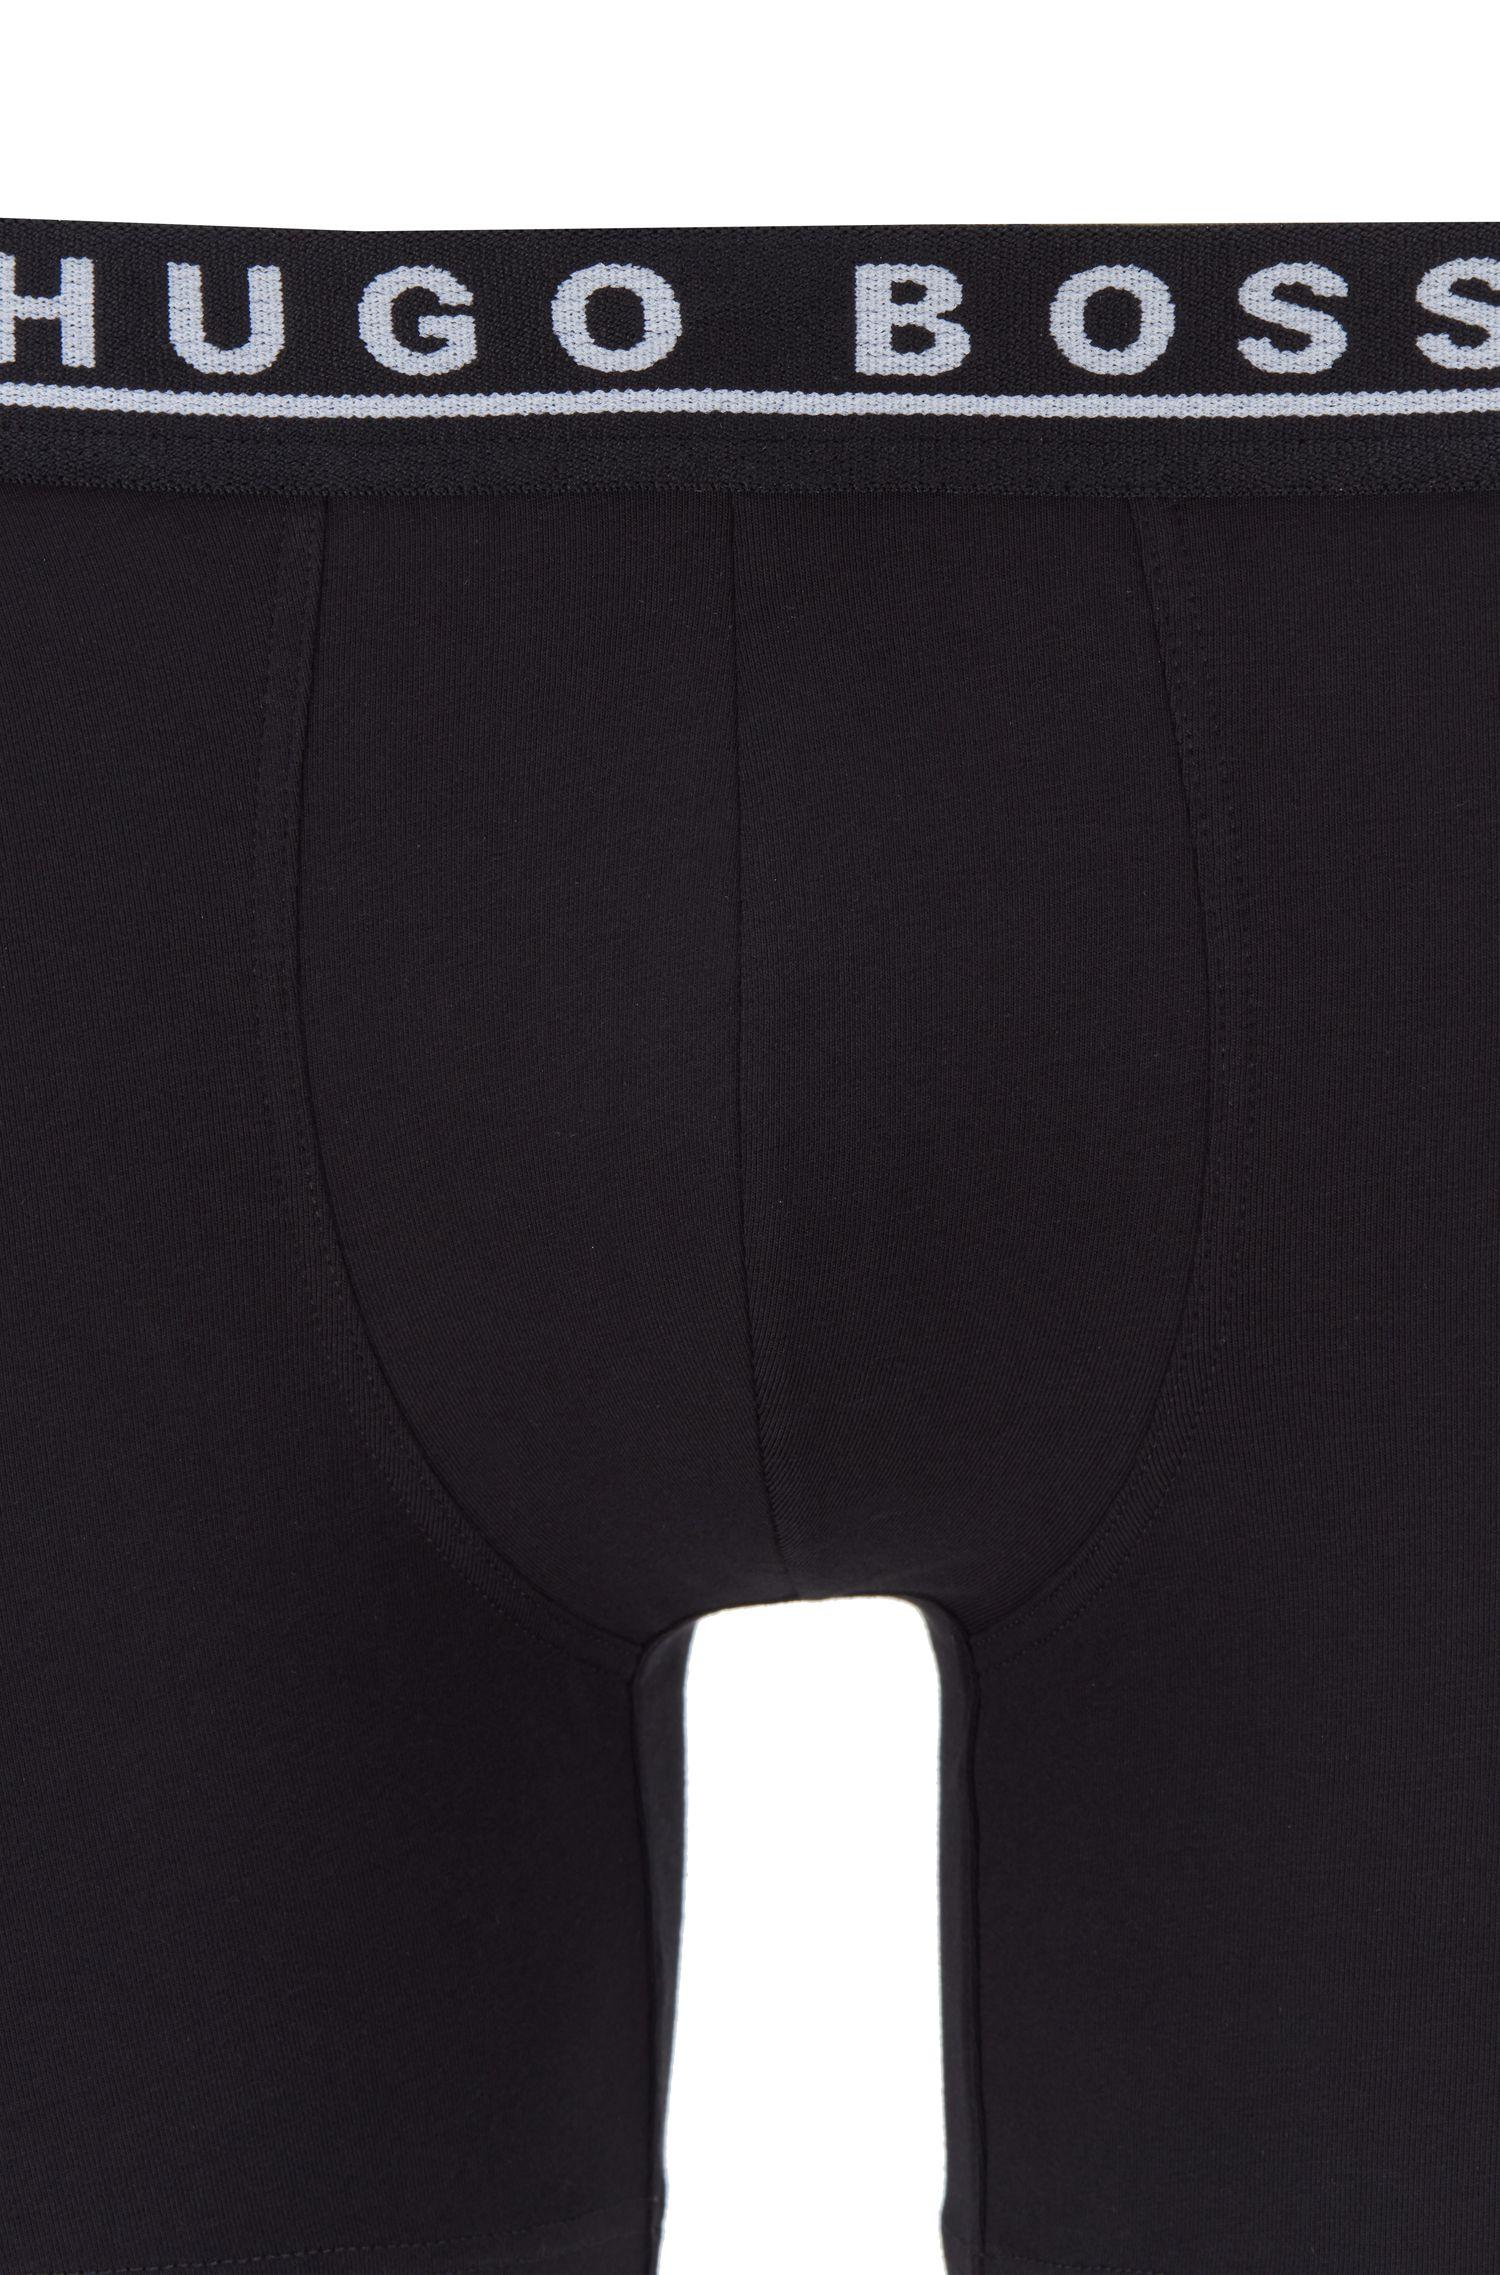 Stretch Cotton Boxer Briefs, 3-Pack | Brief 3P CO/EL, Black